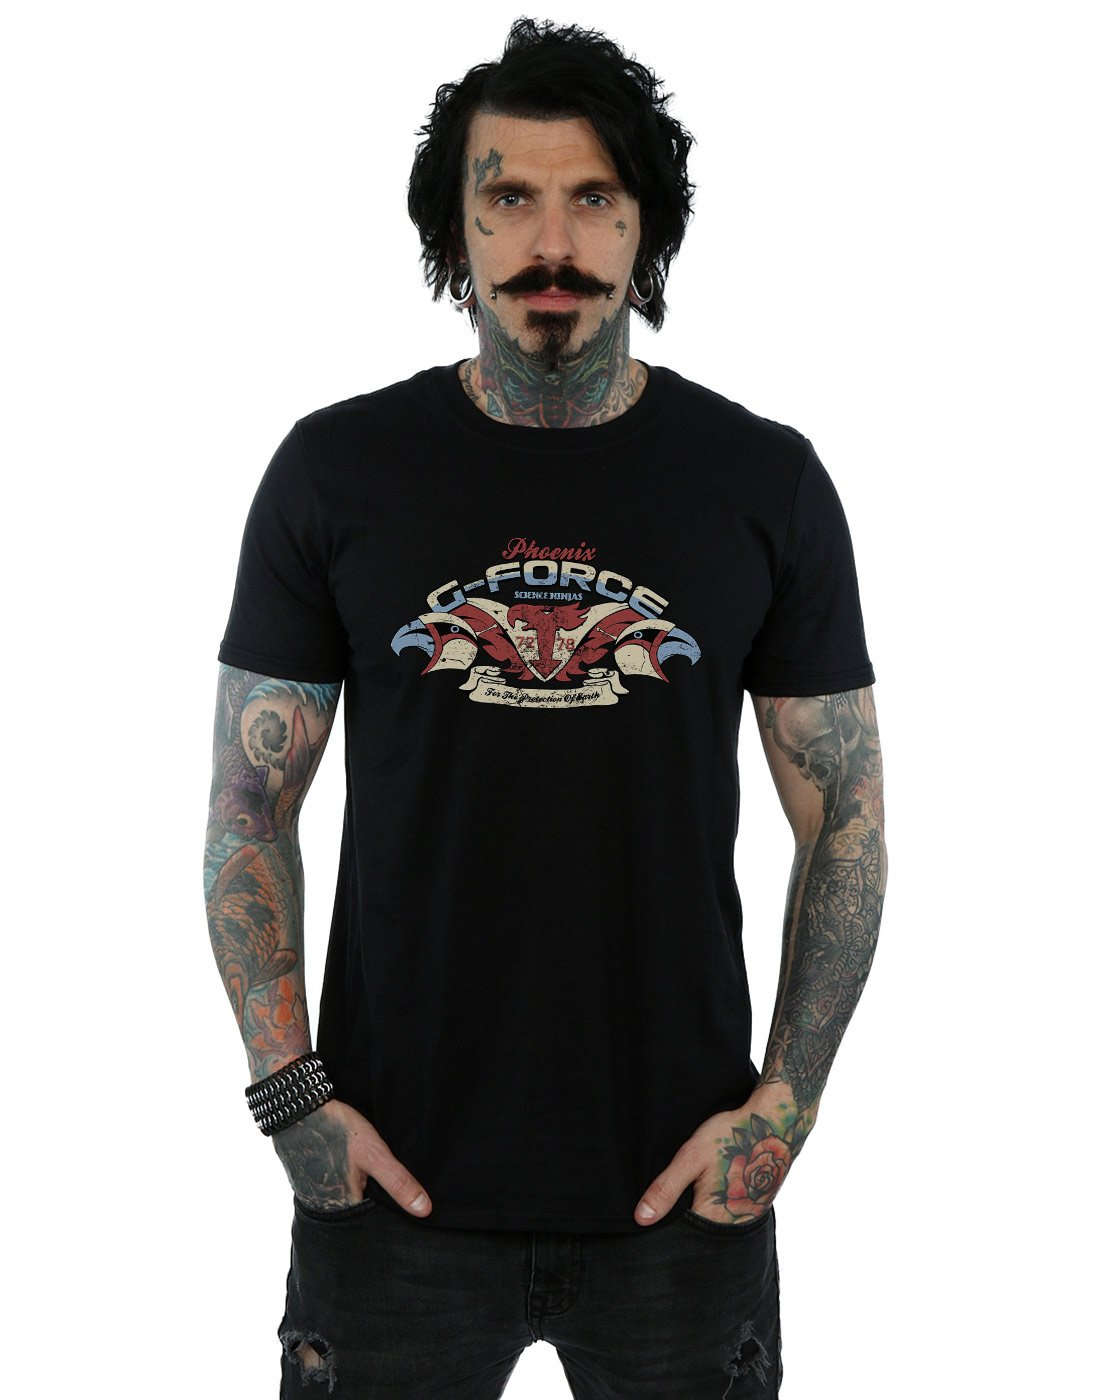 Alex Chenery Phoenix G Force T Shirt 3701